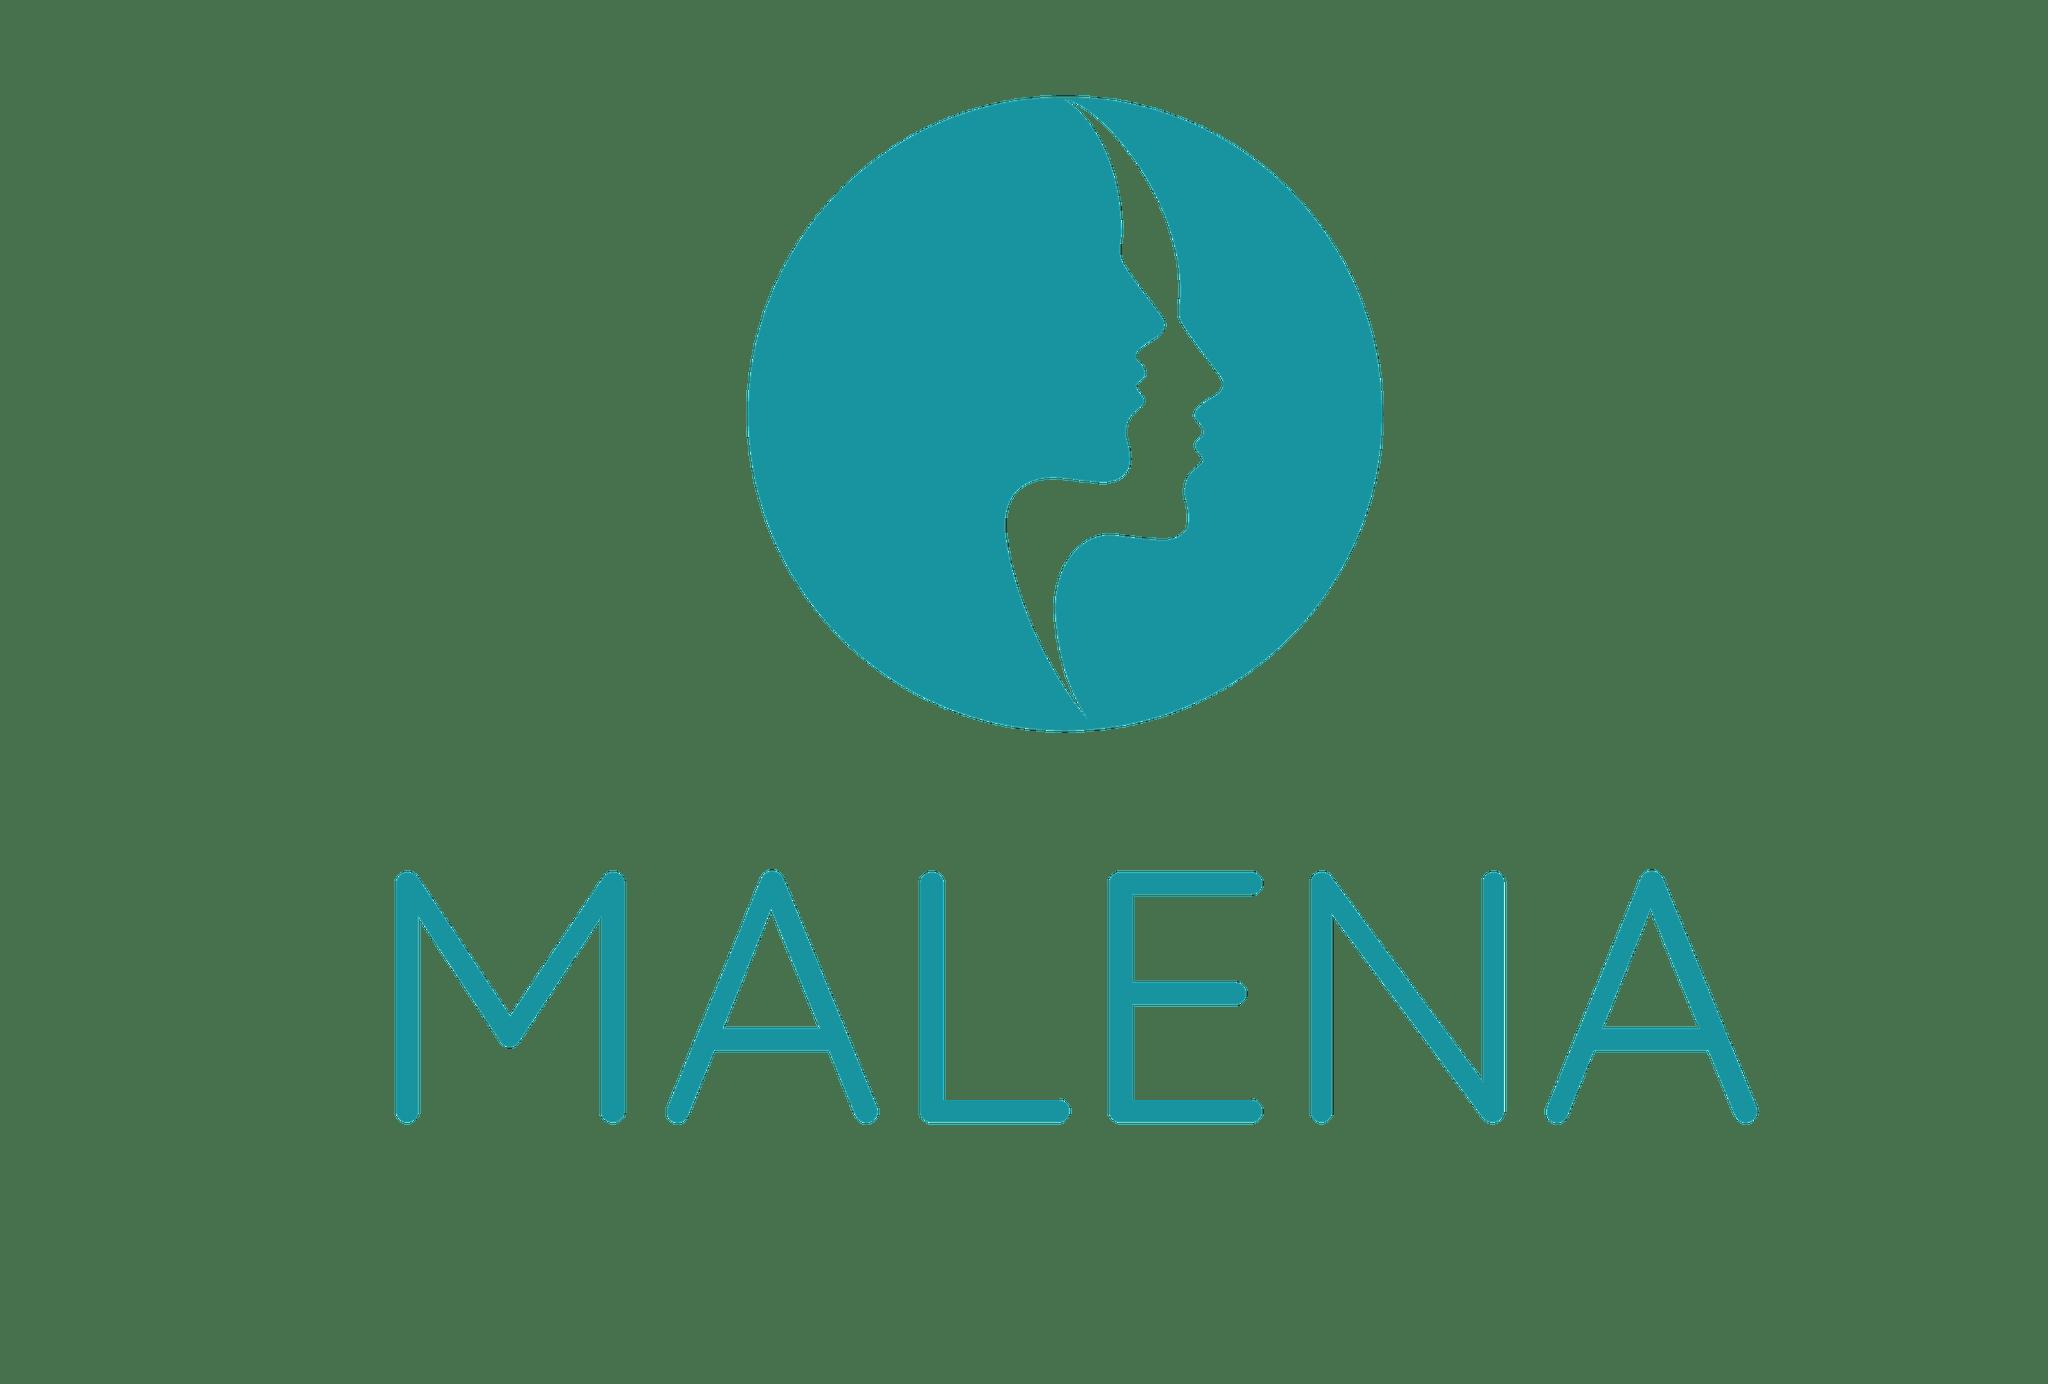 Malena App Portal LLC